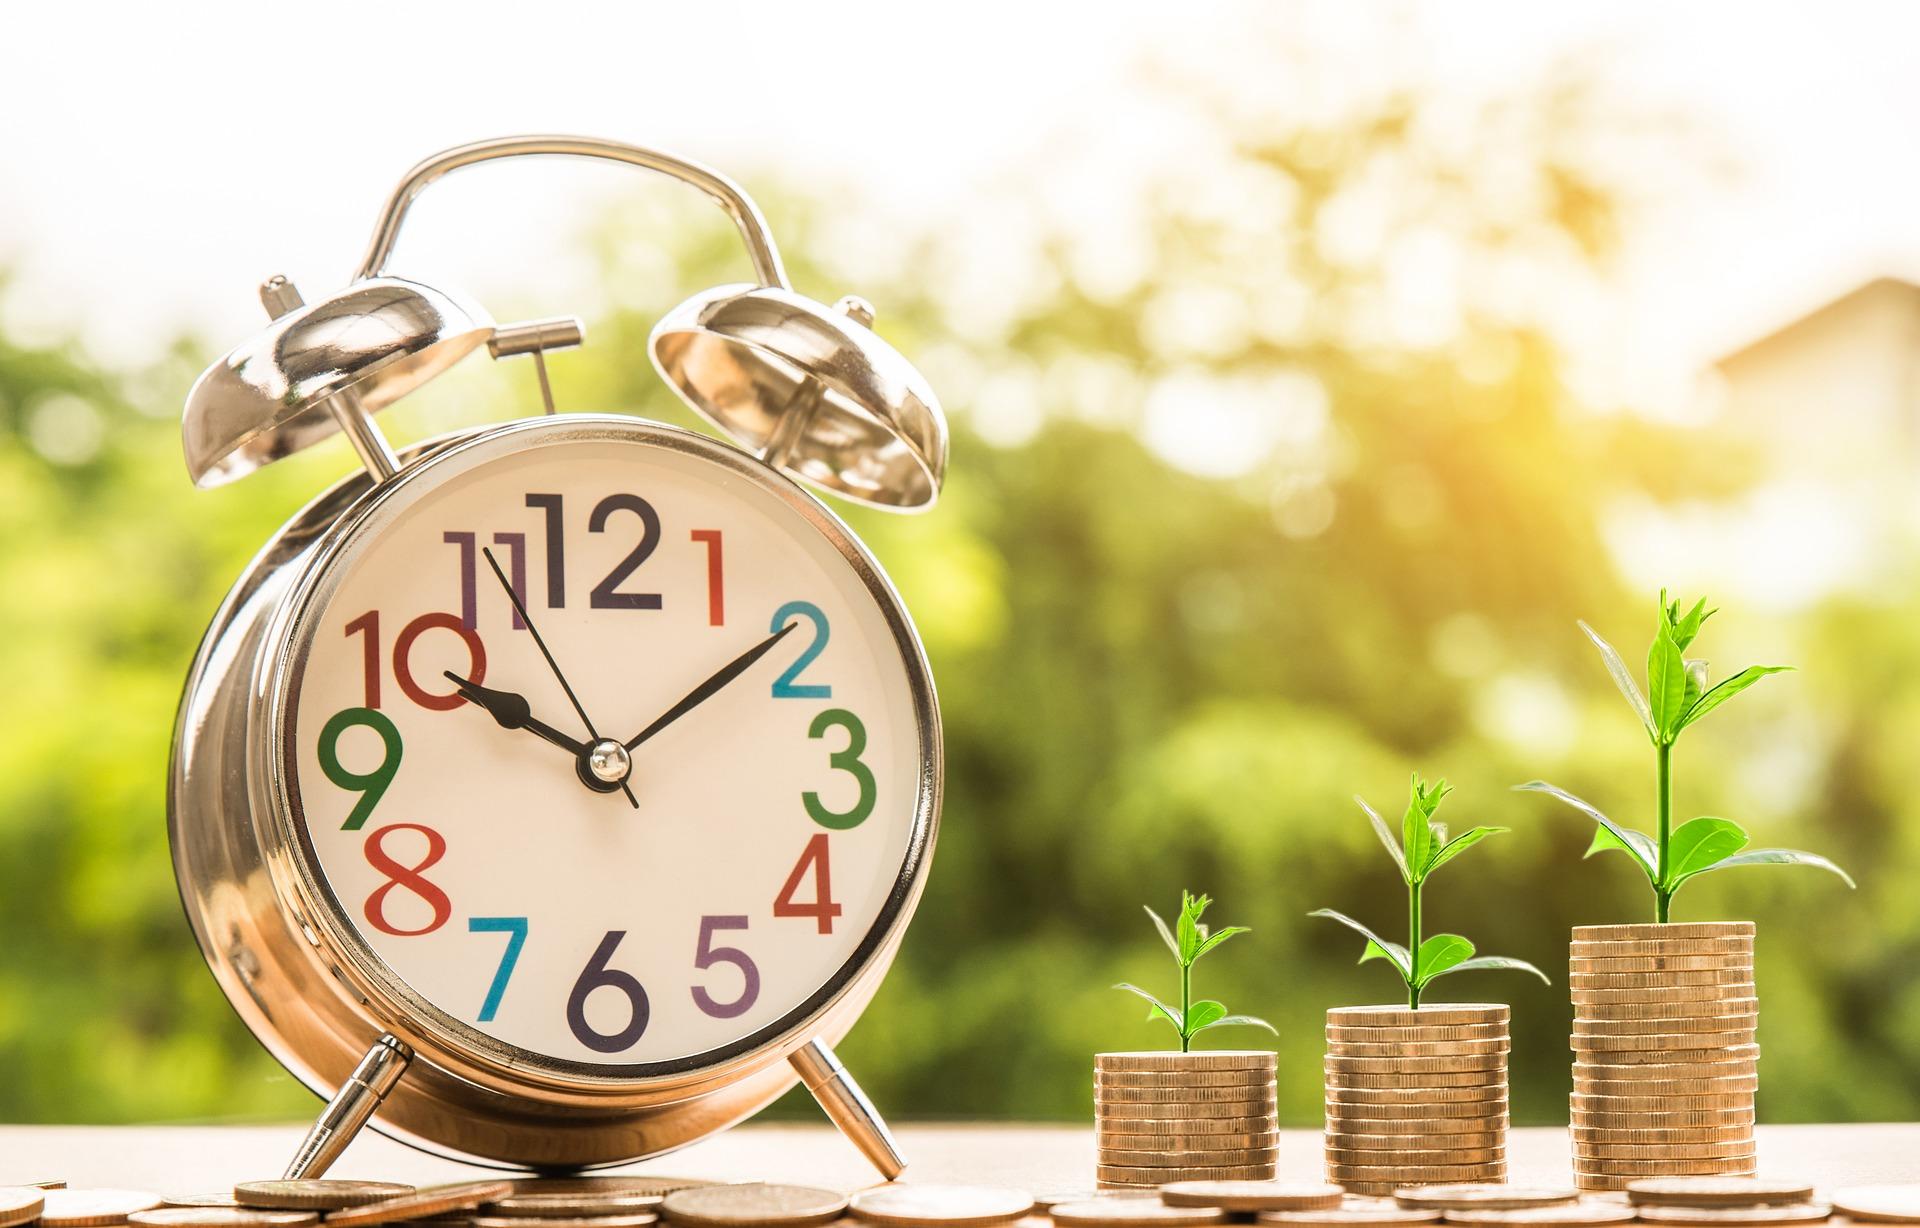 uang, jam, akuntansi, tanaman